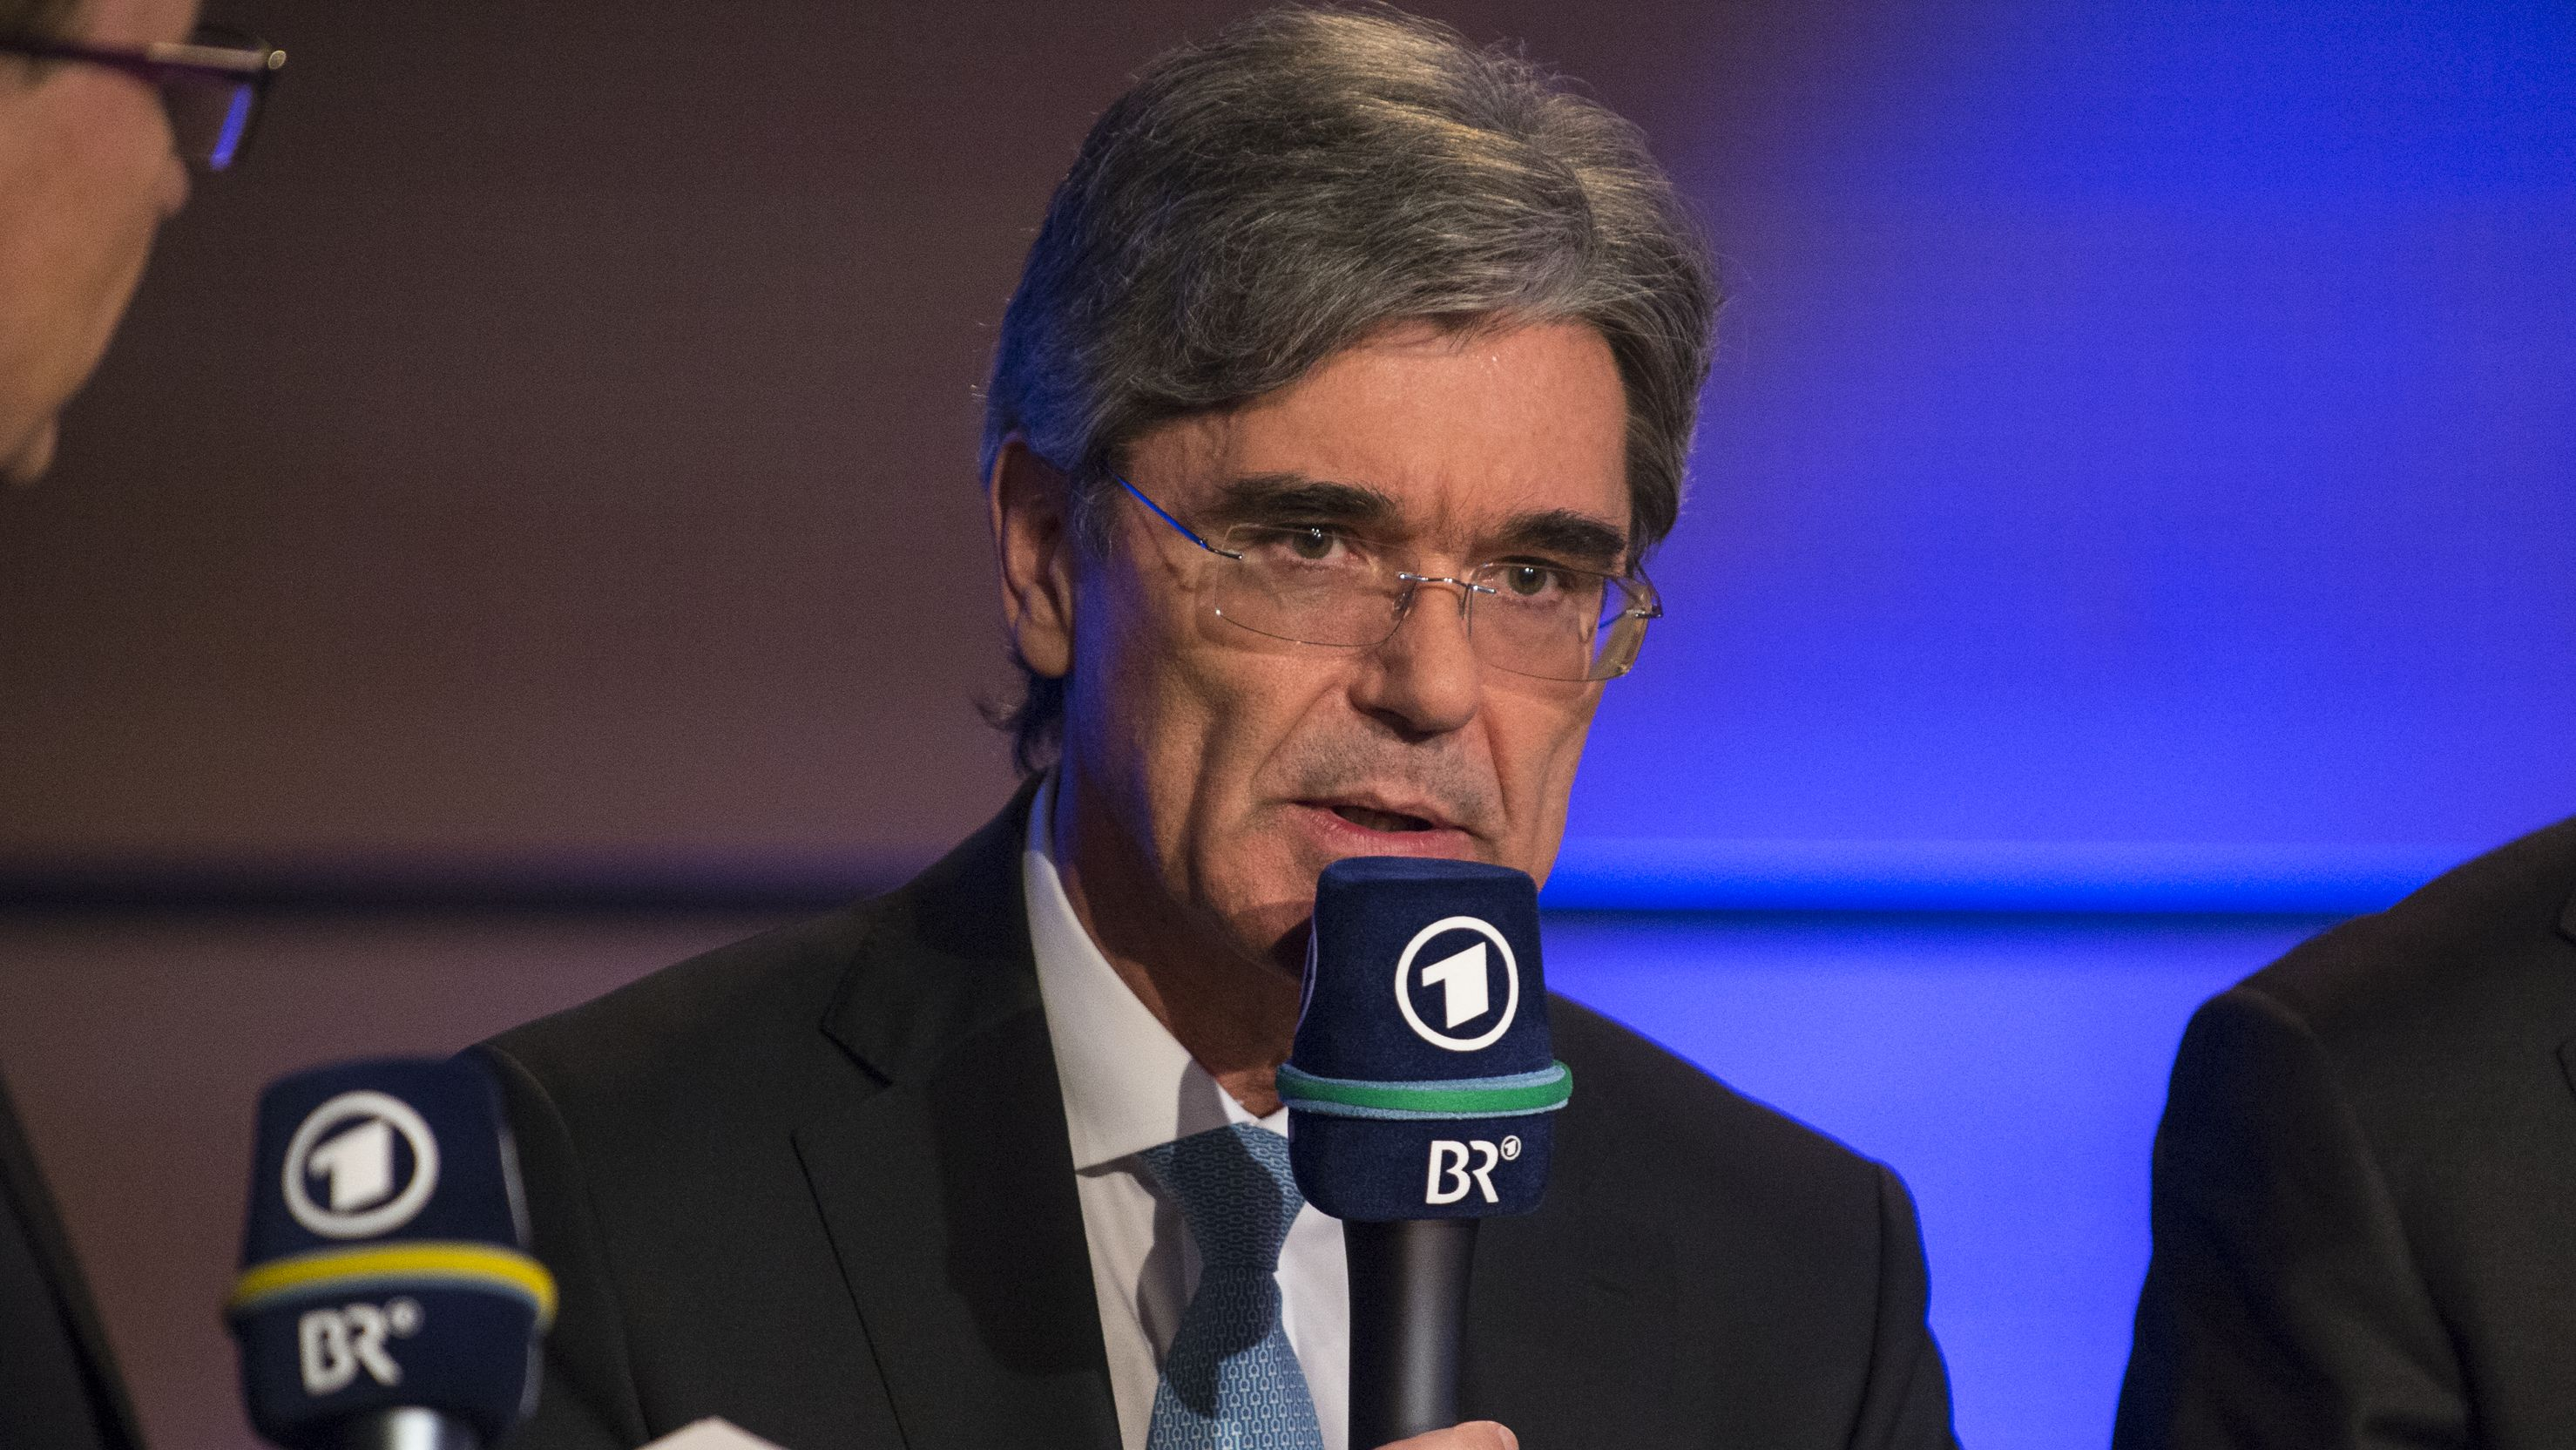 Siemens-Chef Joe Kaeser mit ARD-Mikrofon